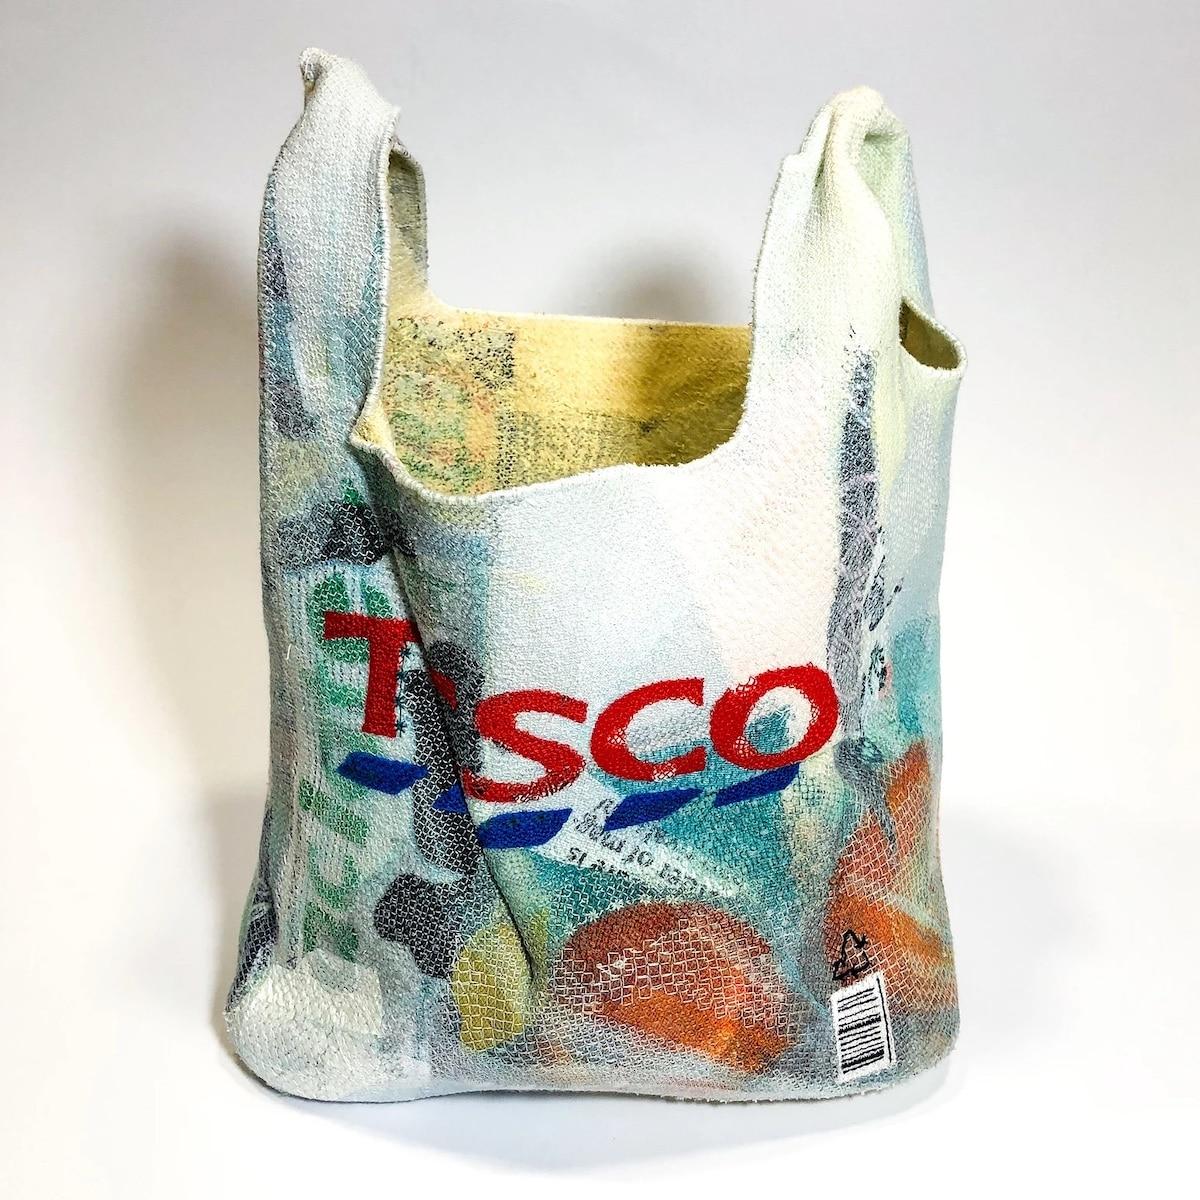 Embroidered Felt Tesco Bag